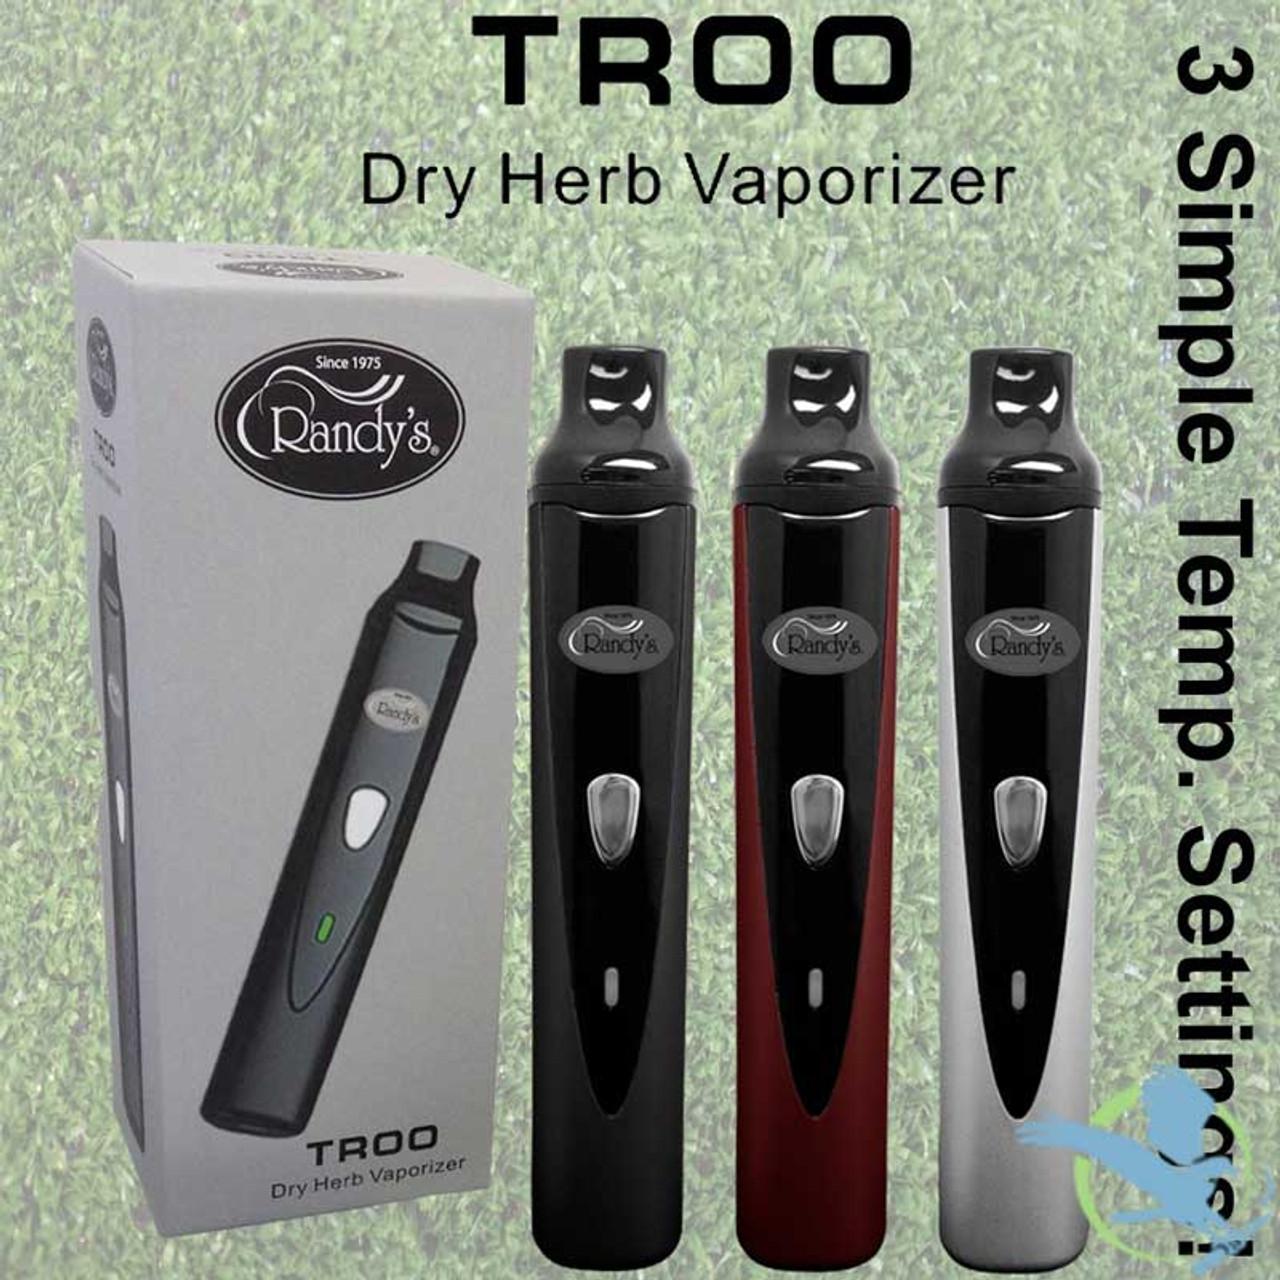 Randy's TROO Dry Herb Vaporizer *Drop Ships* (MSRP $70 00)